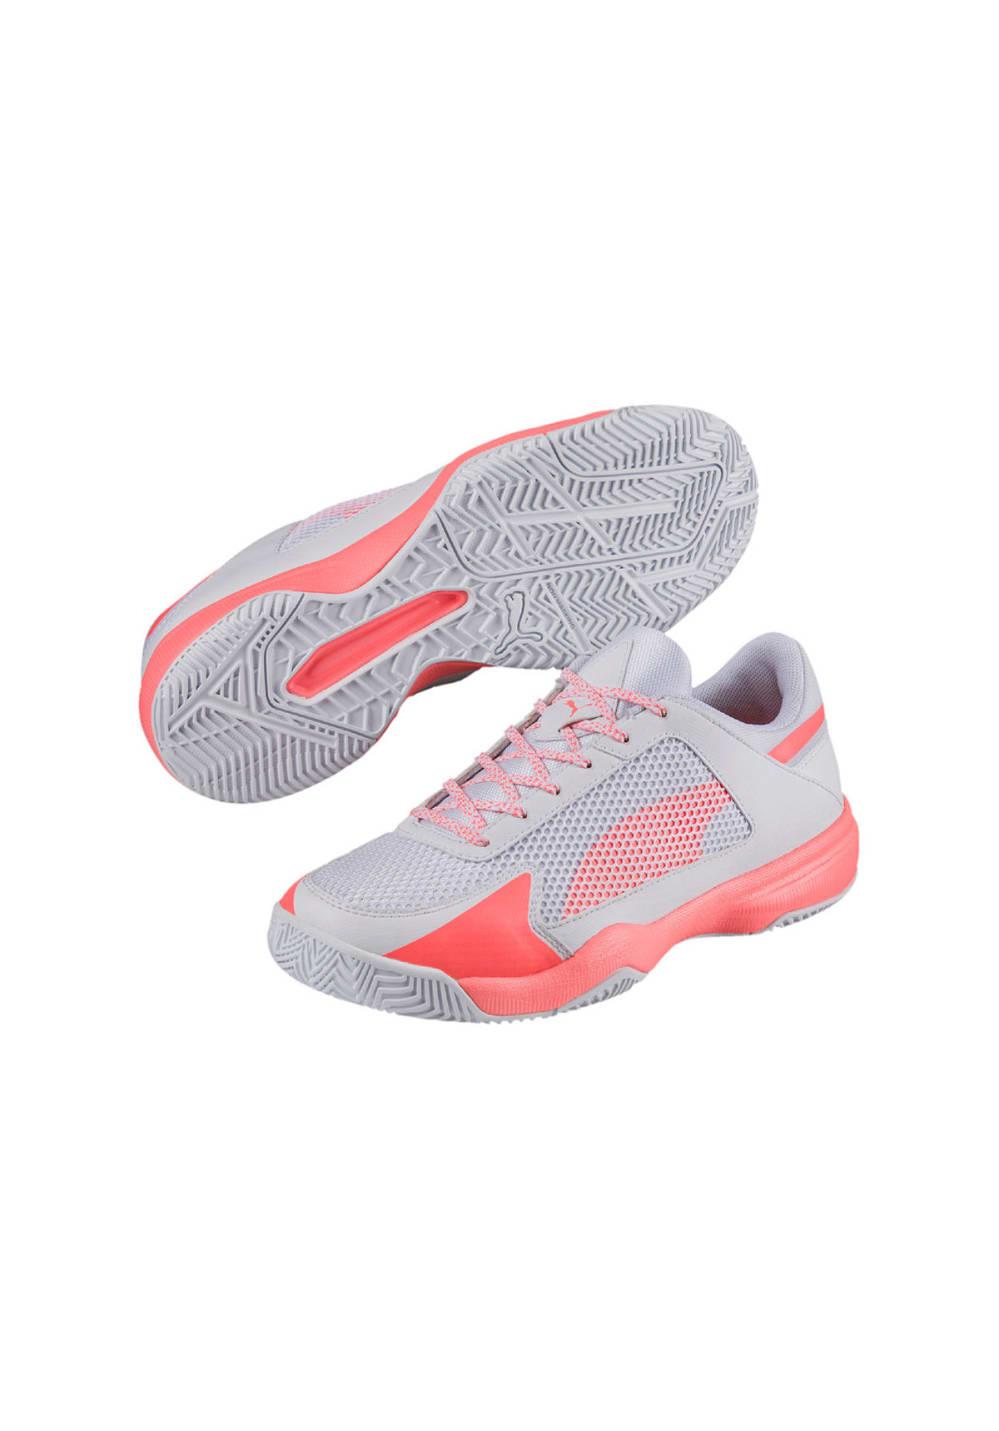 chaussures handball femme puma